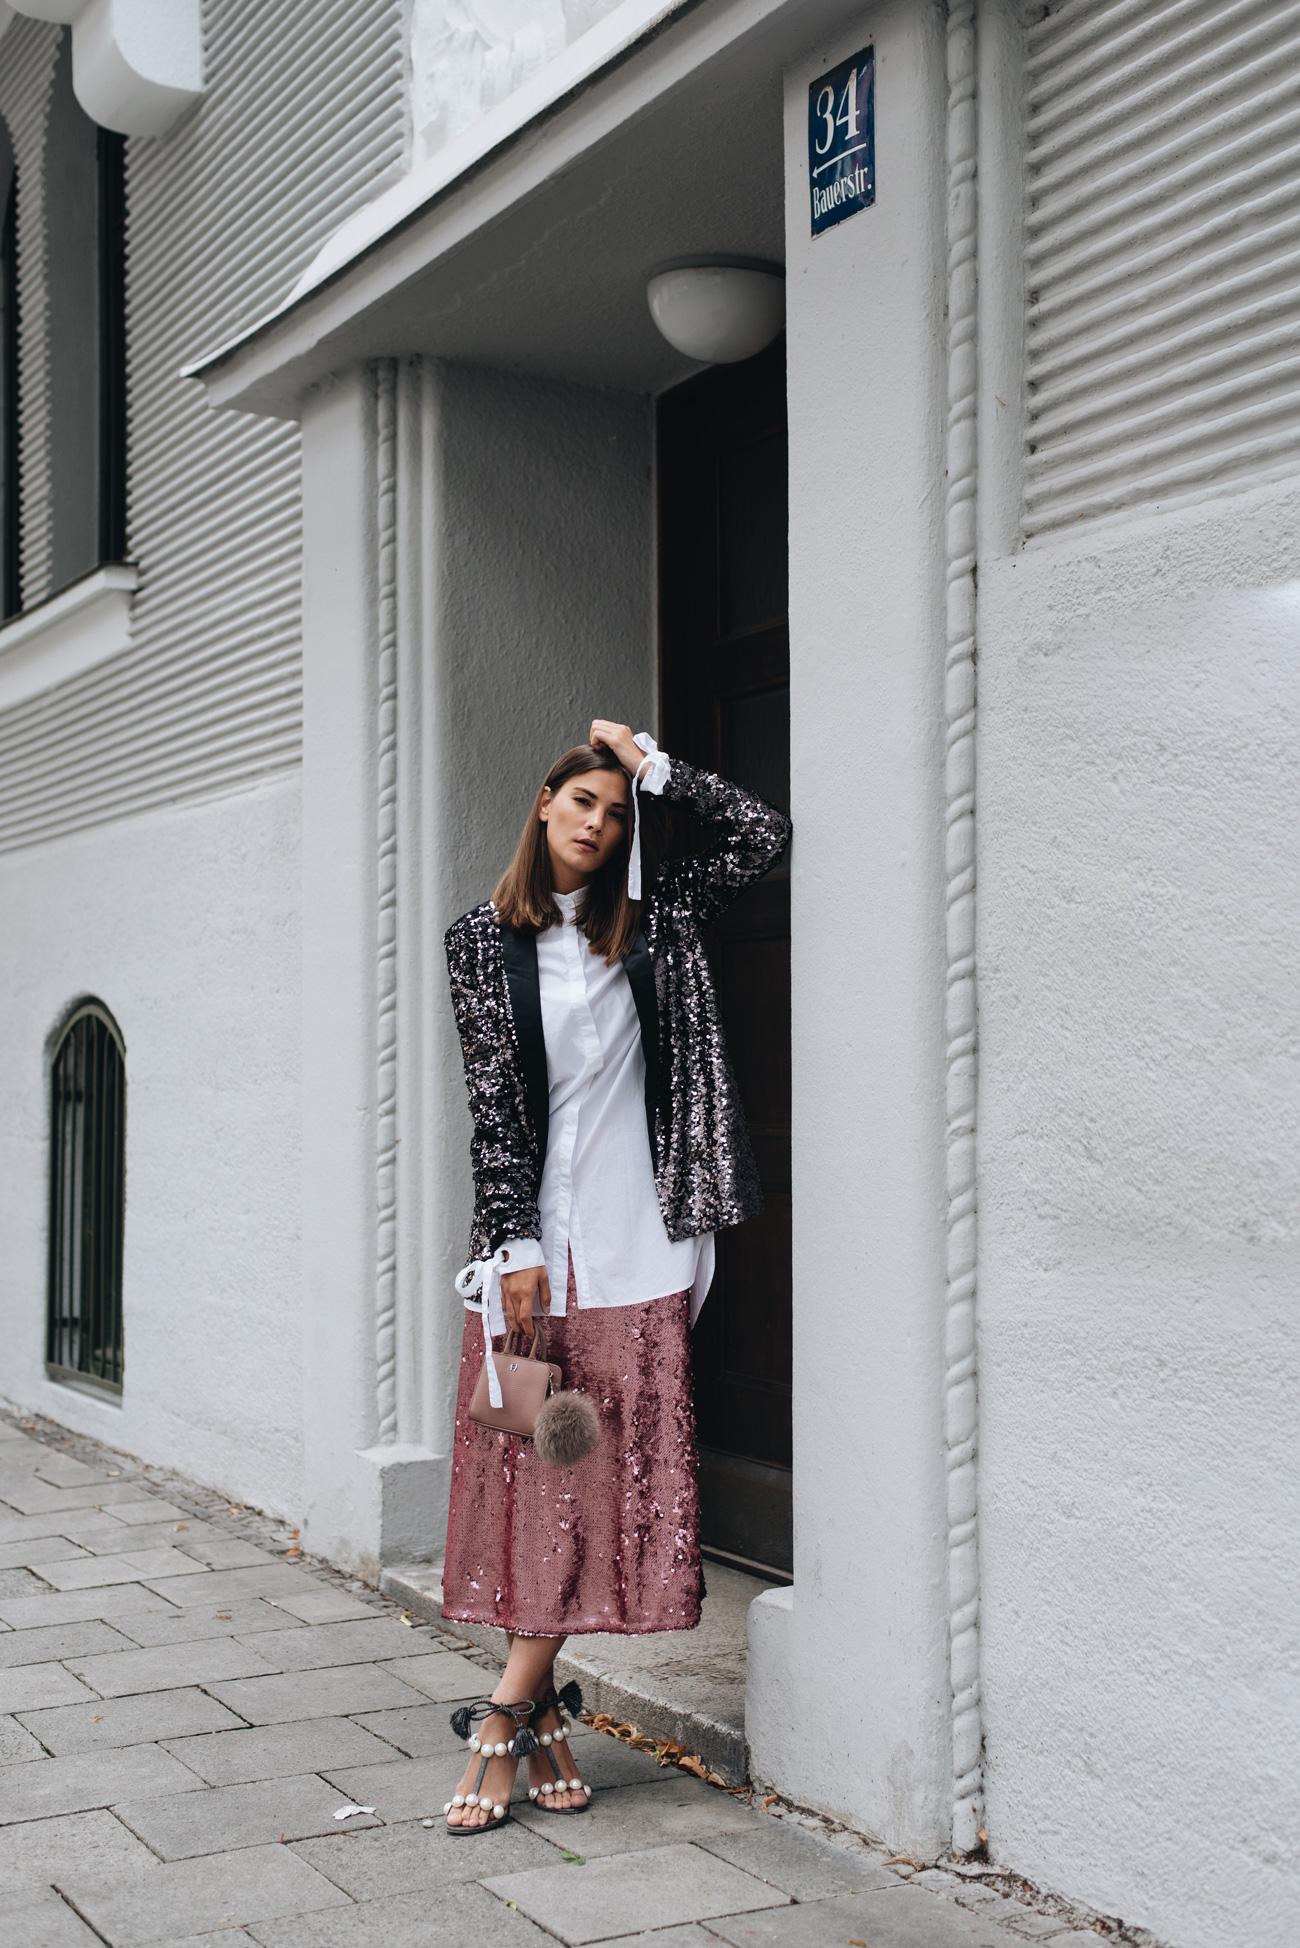 pinker-pailletten-rock-midi-perlen-sandalen-layering-look-fashiioncarpet-nina-schwichtenberg